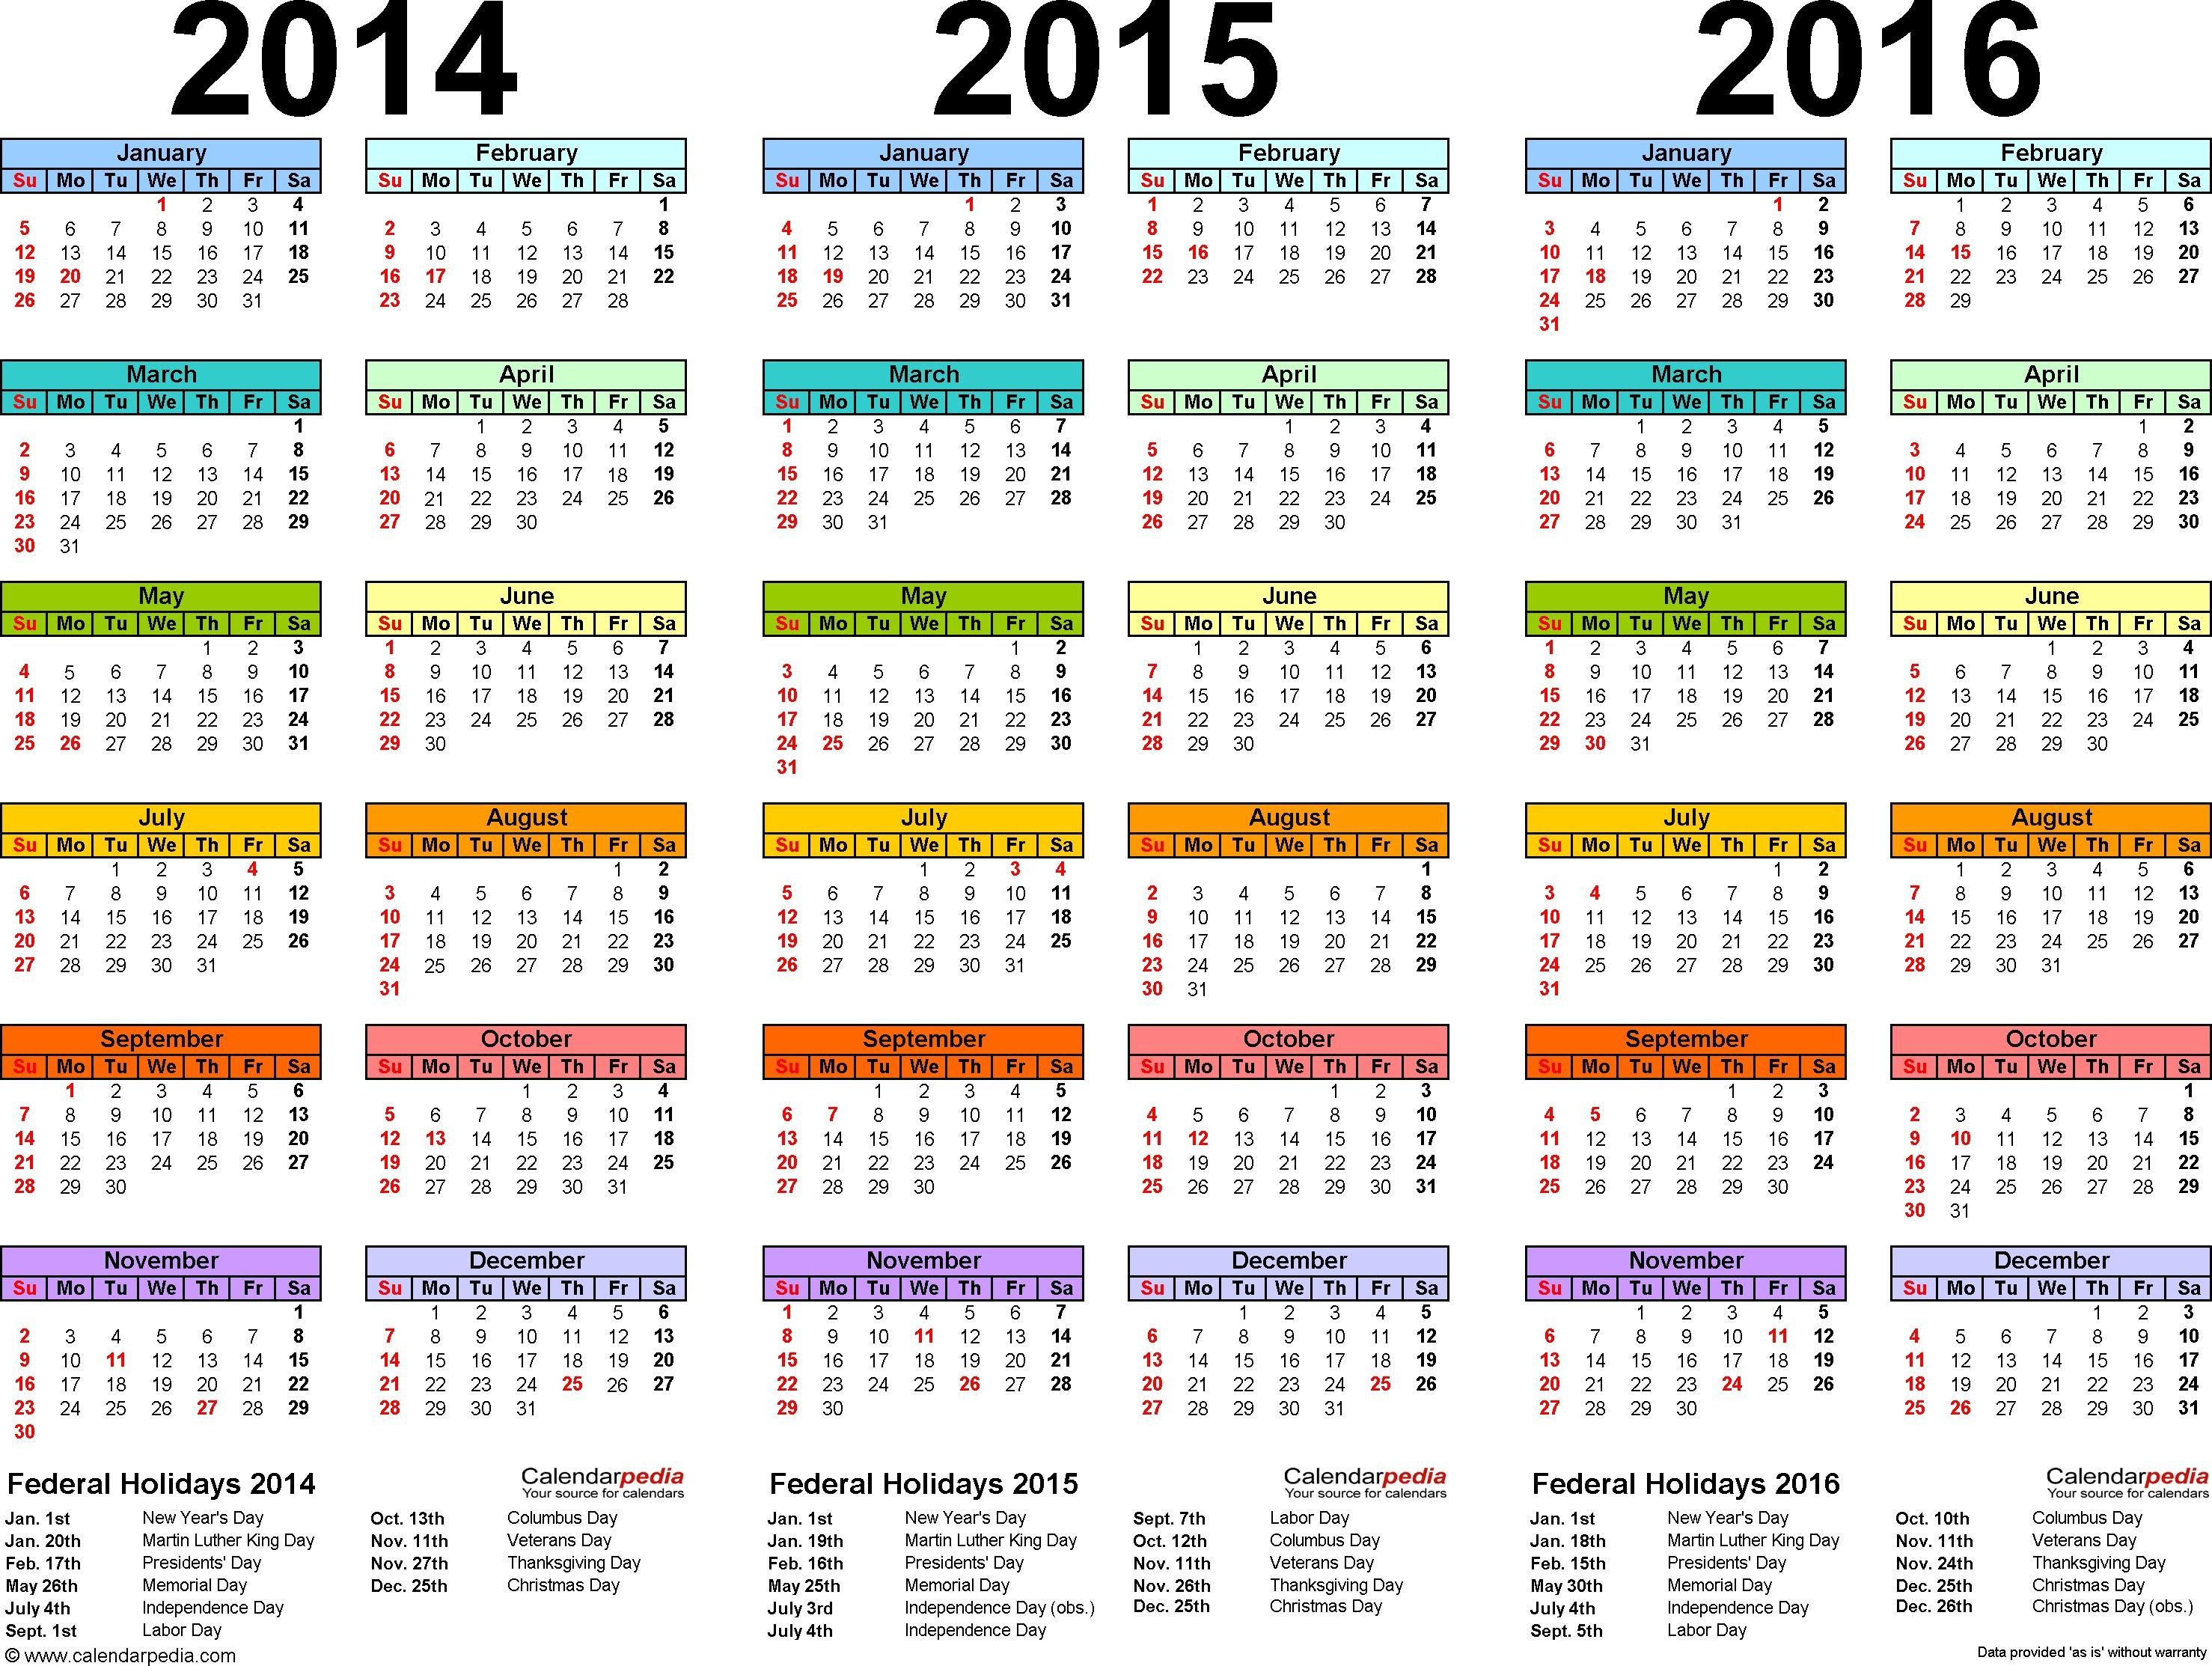 March Calendar Canada Más Recientes Calendar Walmart Canada March 2106 Calendar Ukranochi Of March Calendar Canada Más Arriba-a-fecha Kalender Ausdrucken 2015 Schön Printable 0d Calendars Kalender